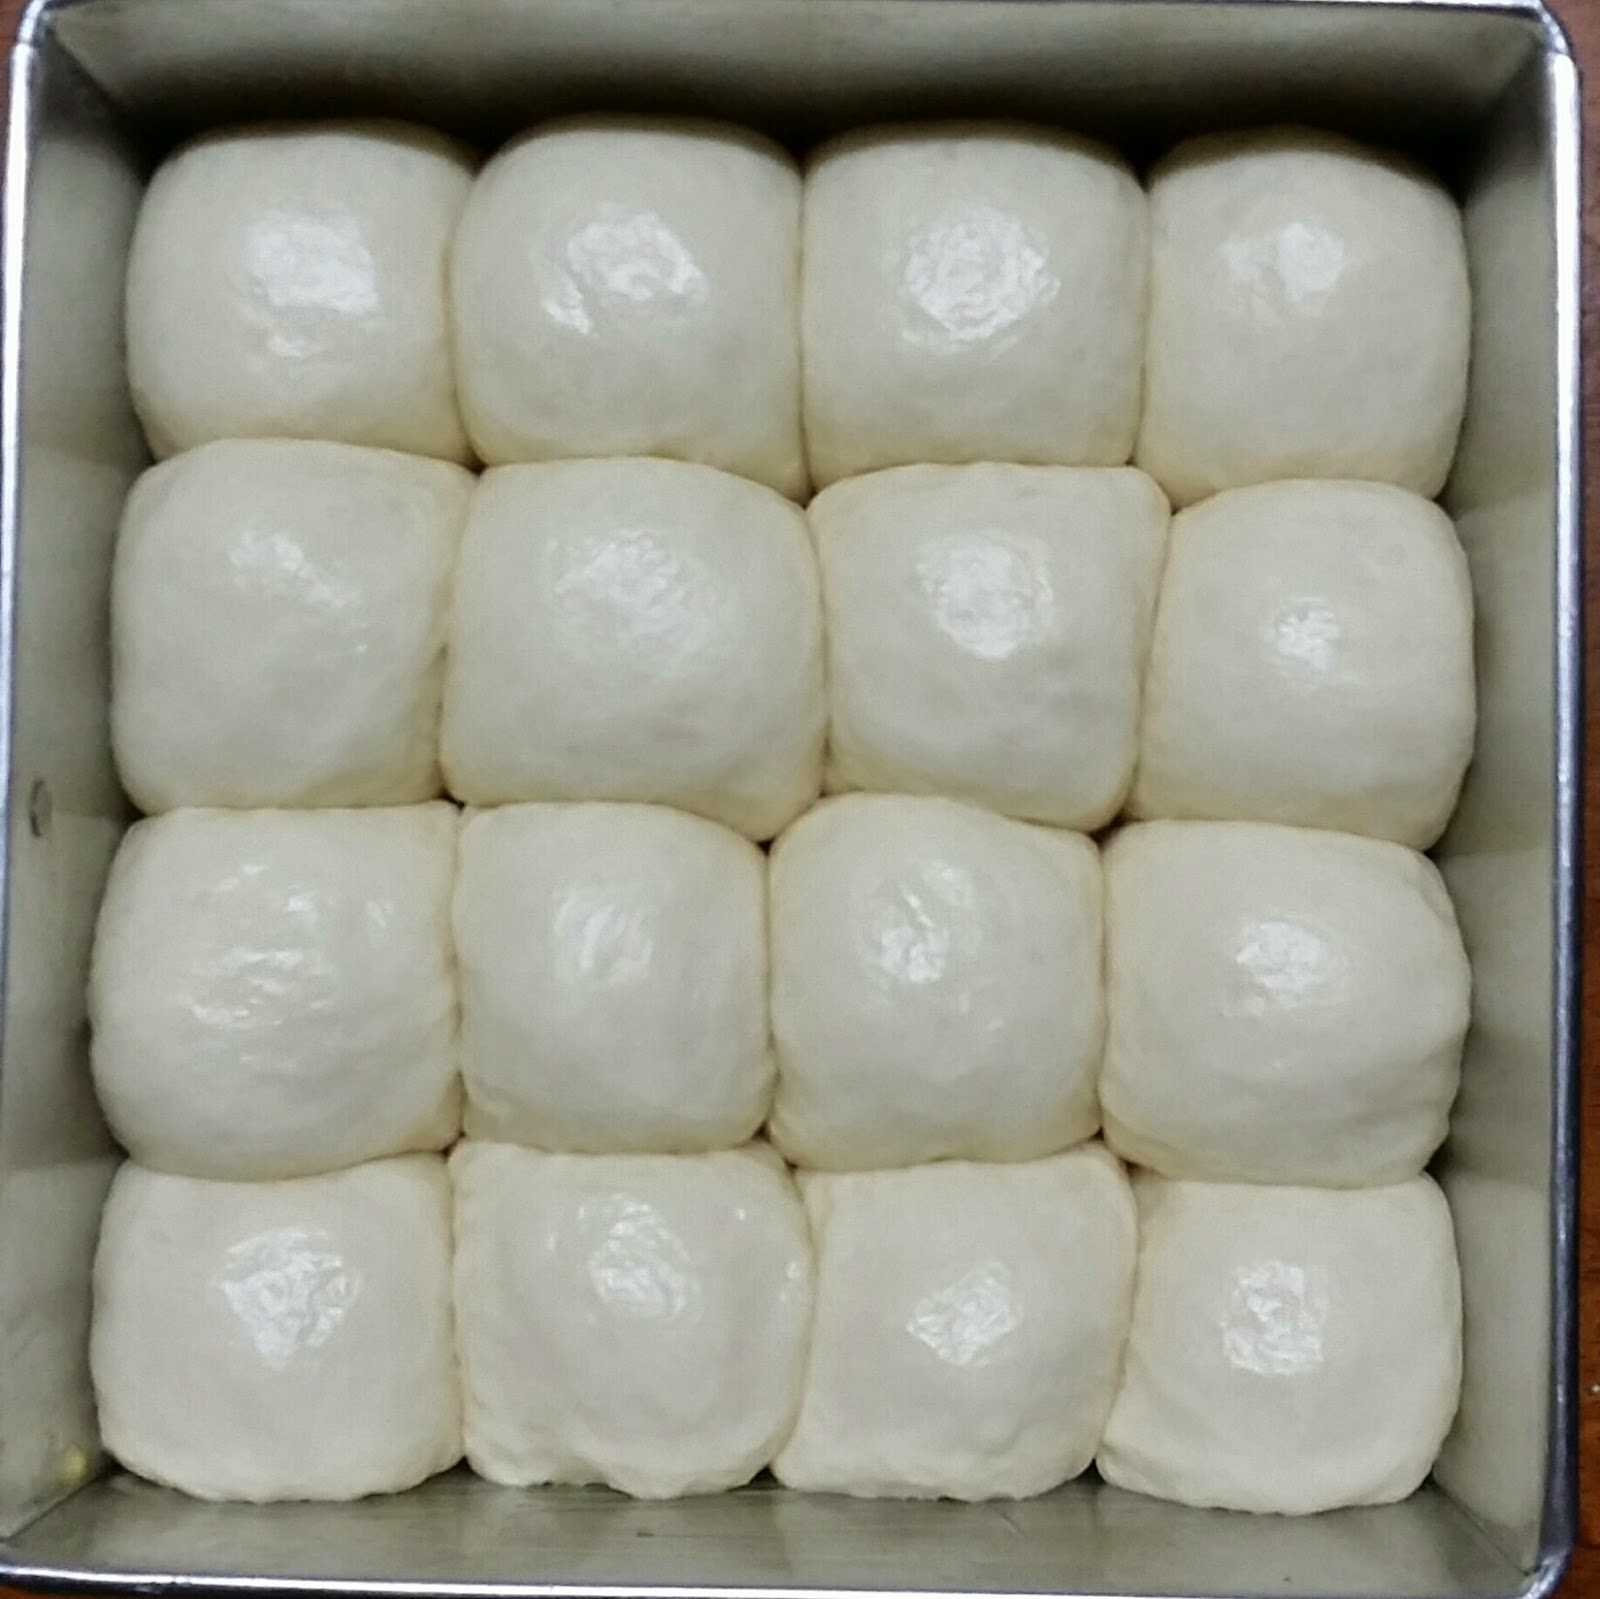 Resepi Roti Bun Manis Dan Cara Buat Roti Bun Yang Sedap ...